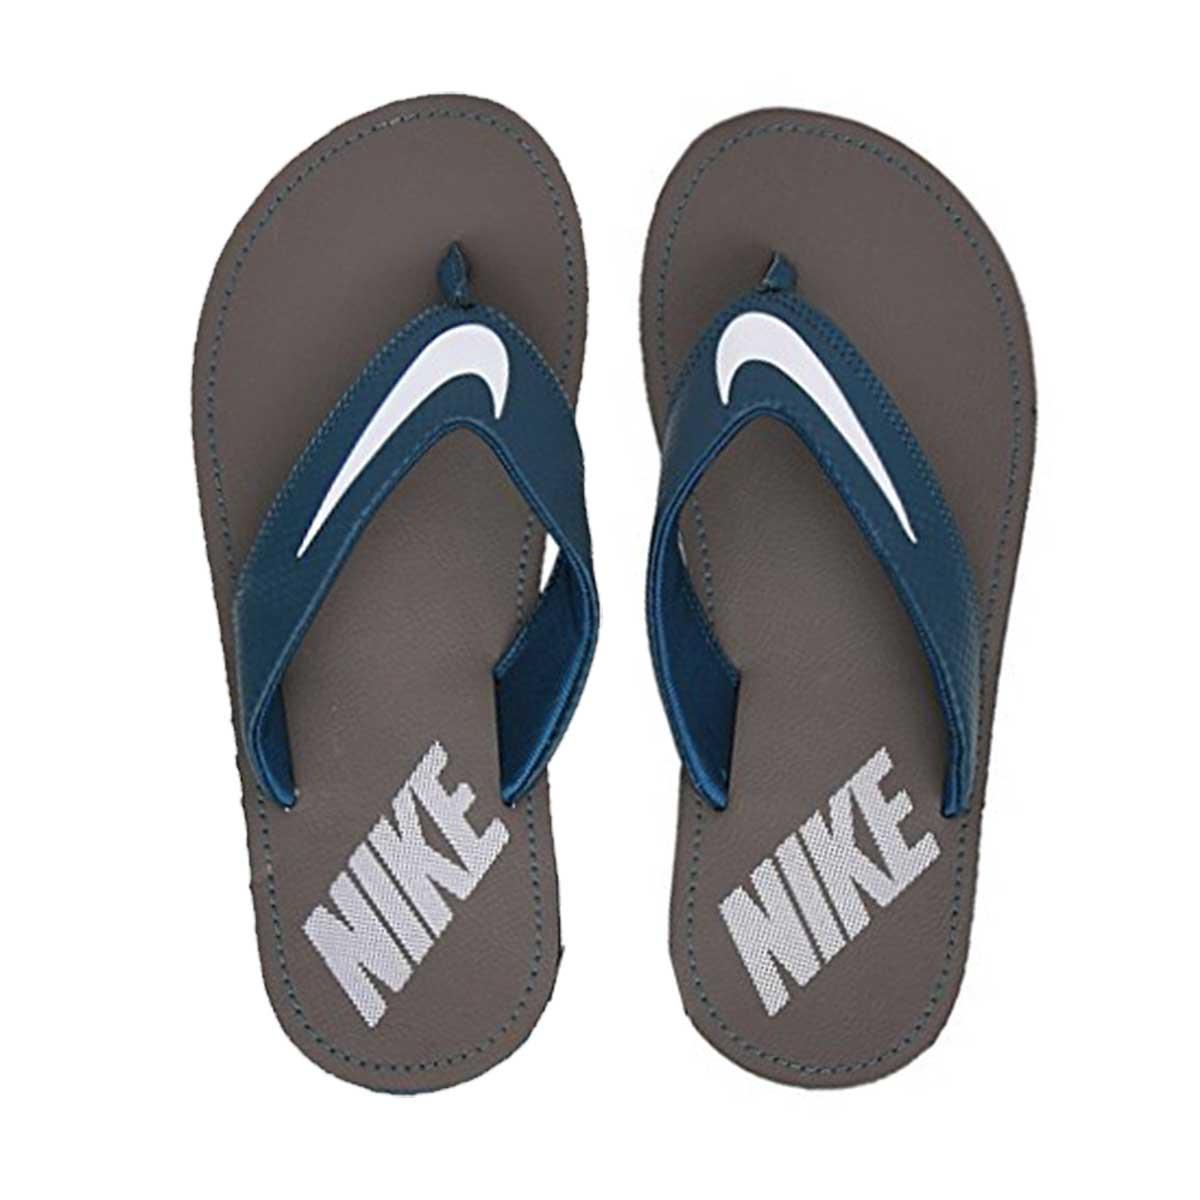 fb22f99c7 Buy Nike Chroma Thong 4 Men Slippers Online India